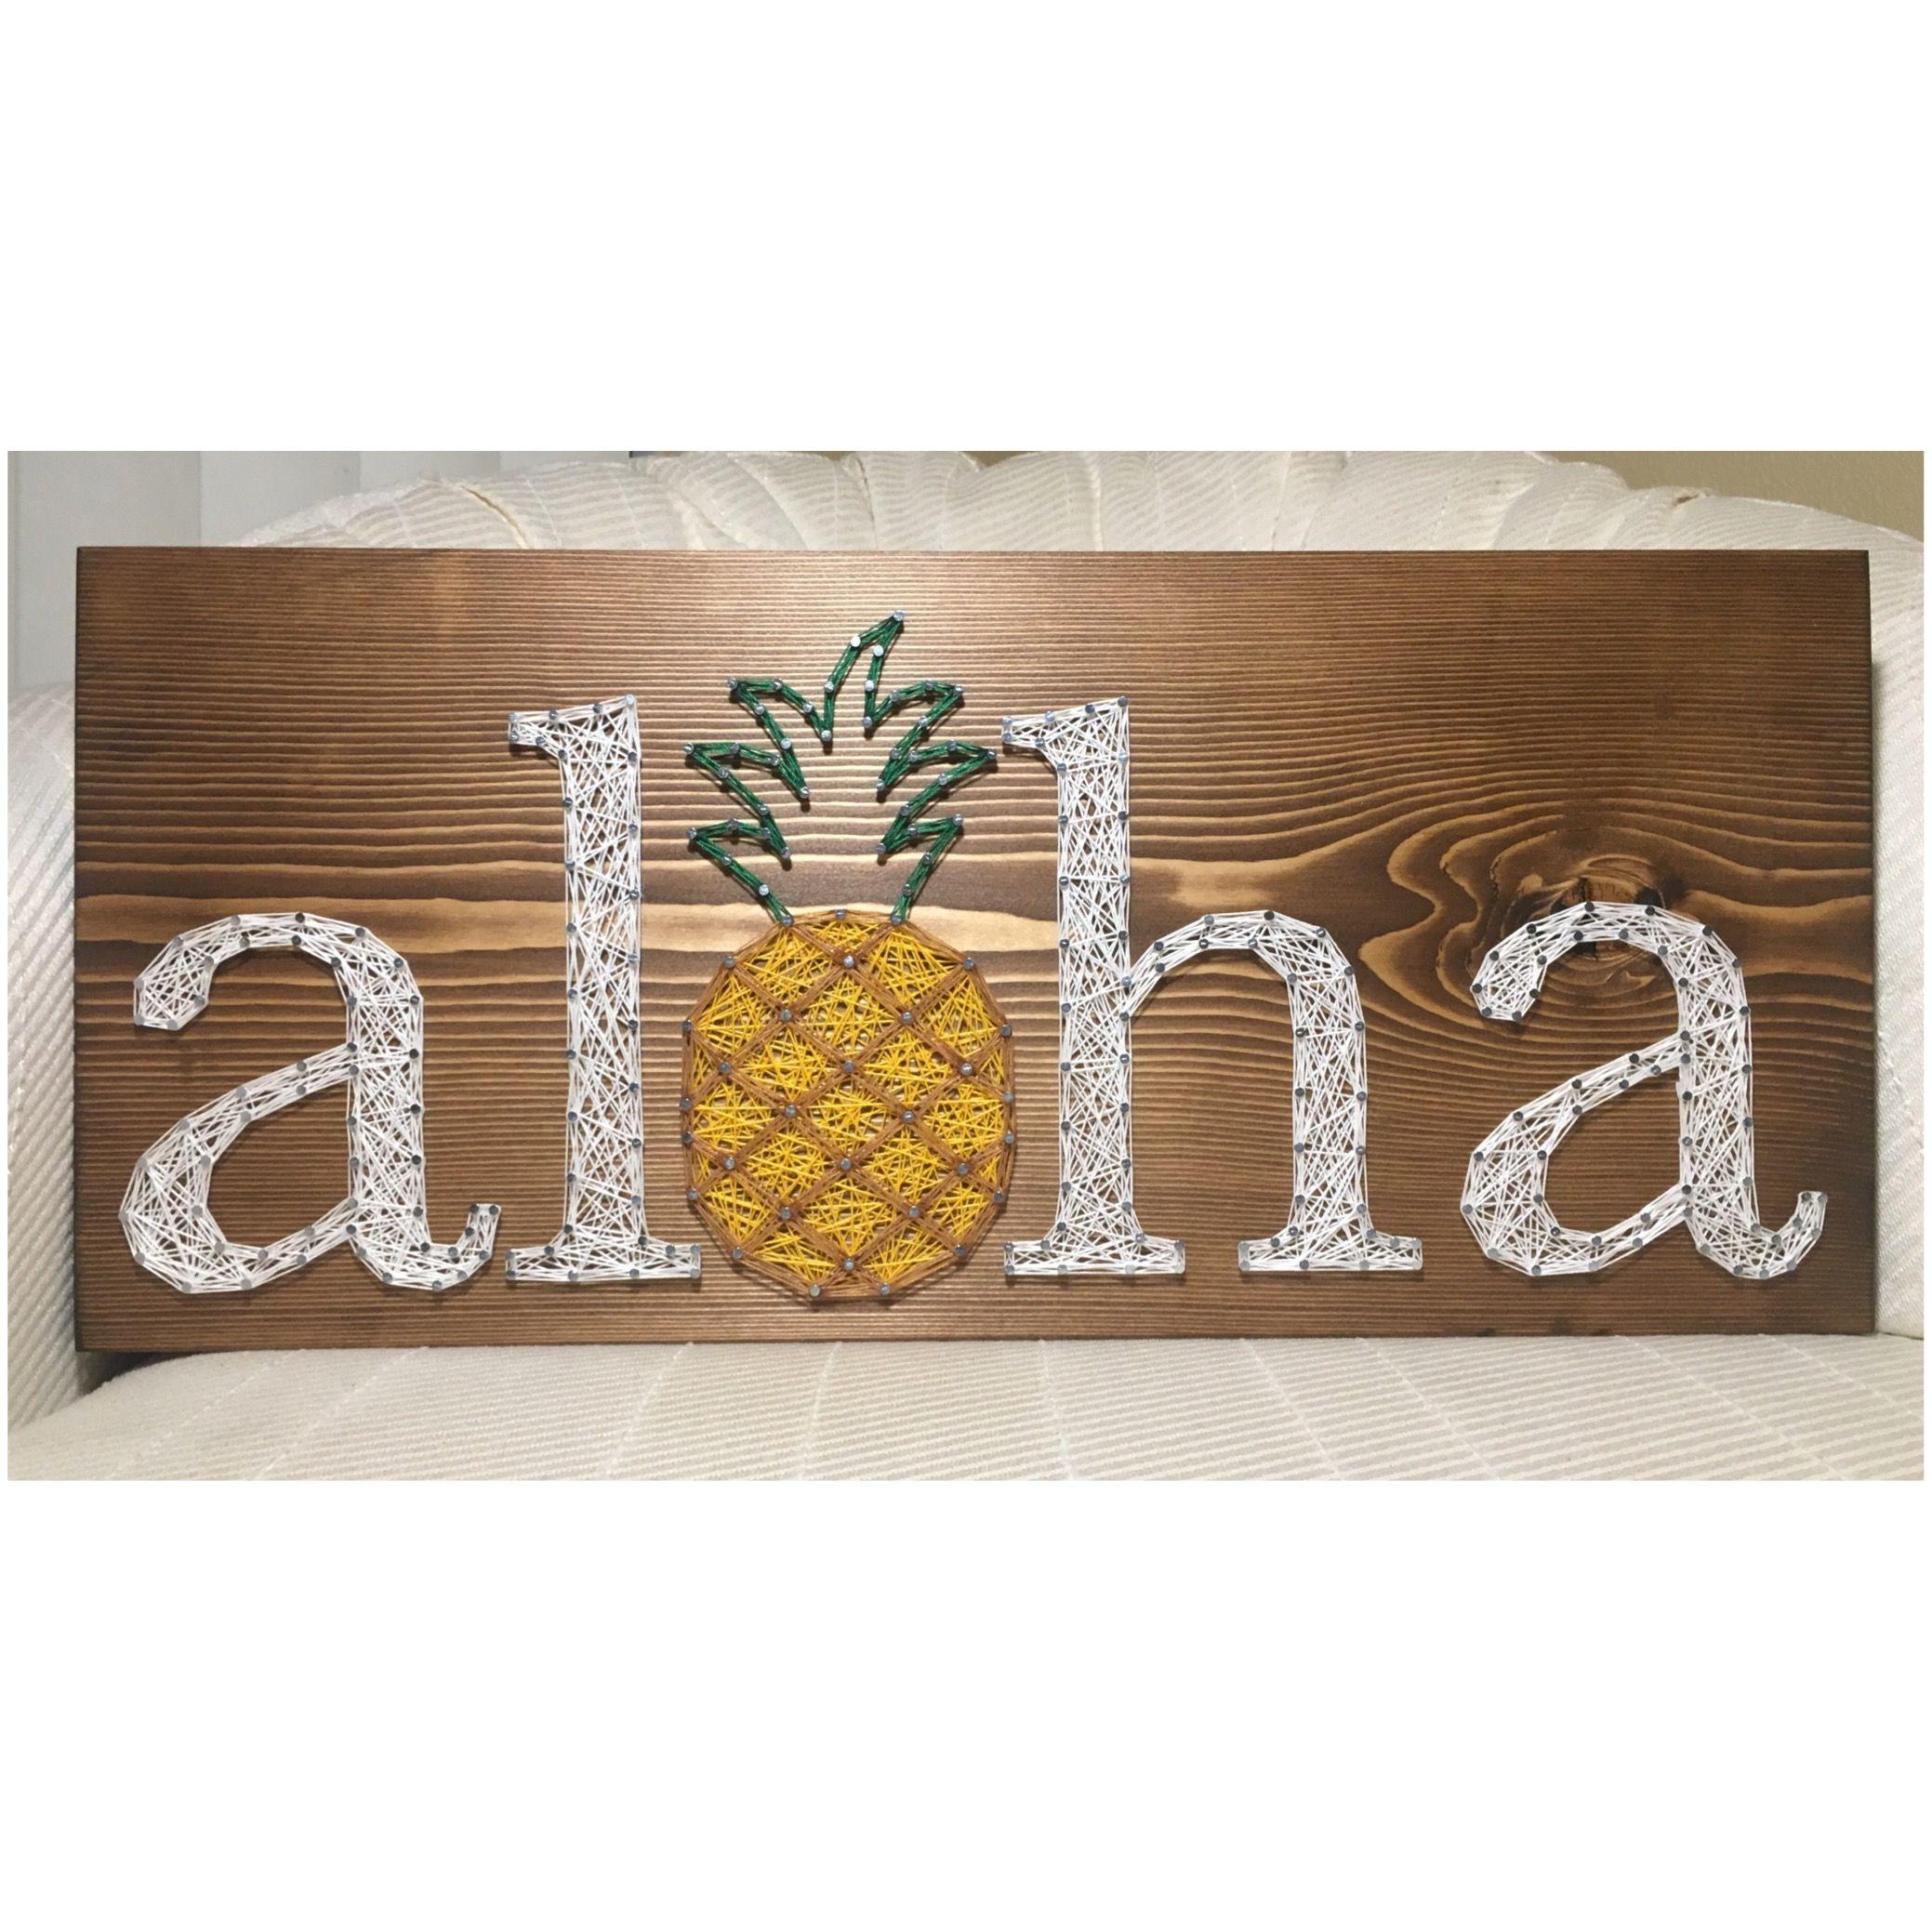 String Art: Aloha String Art, Pineapple, Hawaii- Order From